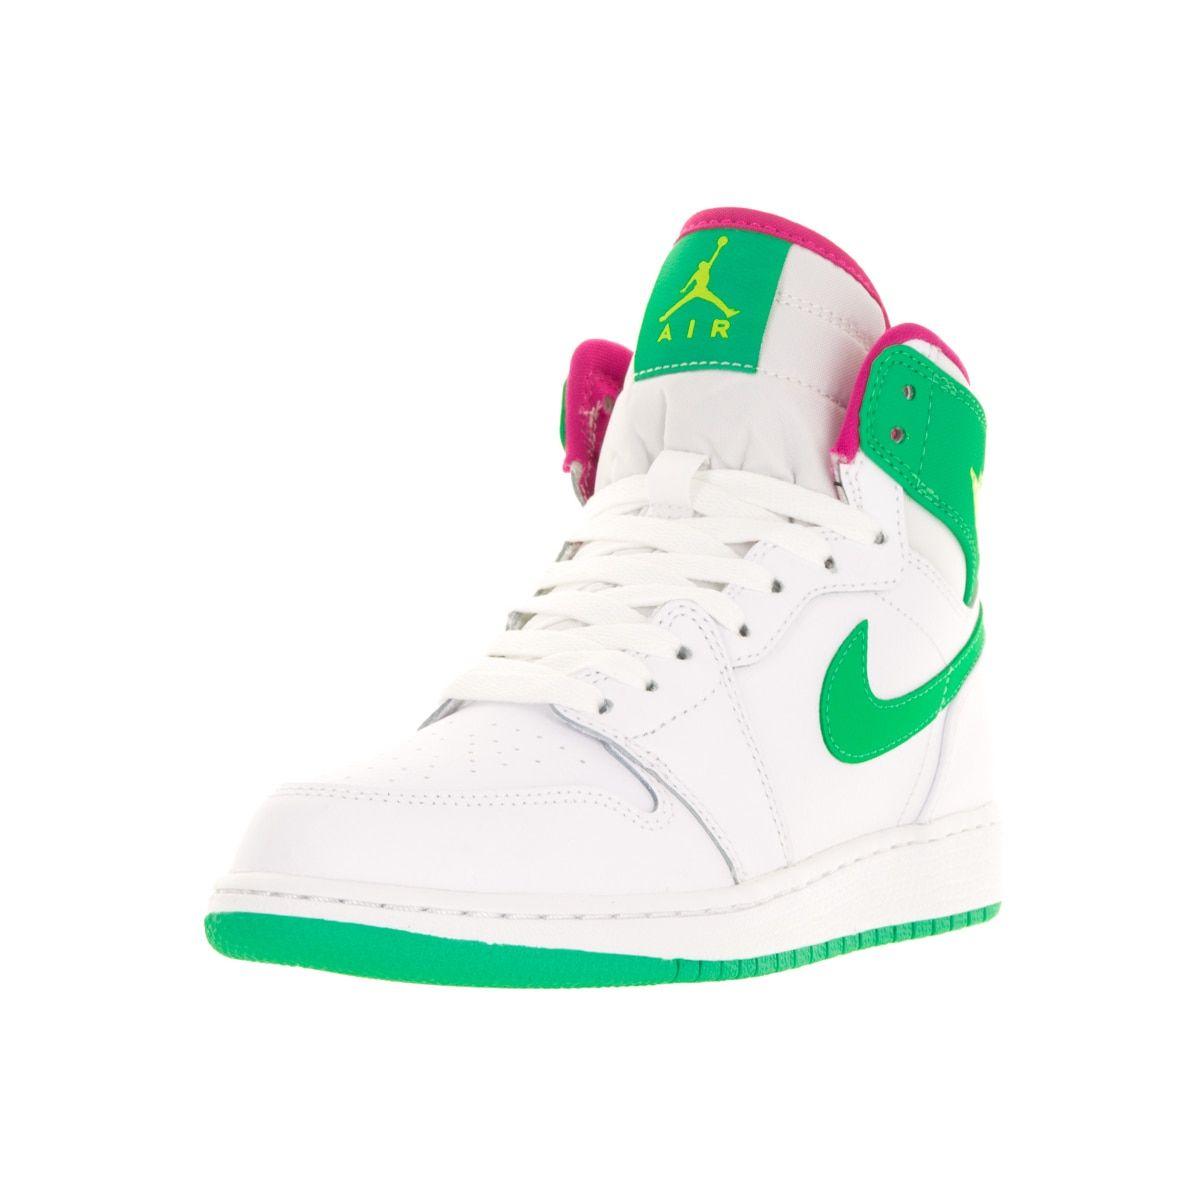 best service ef152 c2143 Nike Jordan Kids Air Jordan 1 Retro High GG  Gamma Green Vivid Pink Cyber  Basketball Shoes